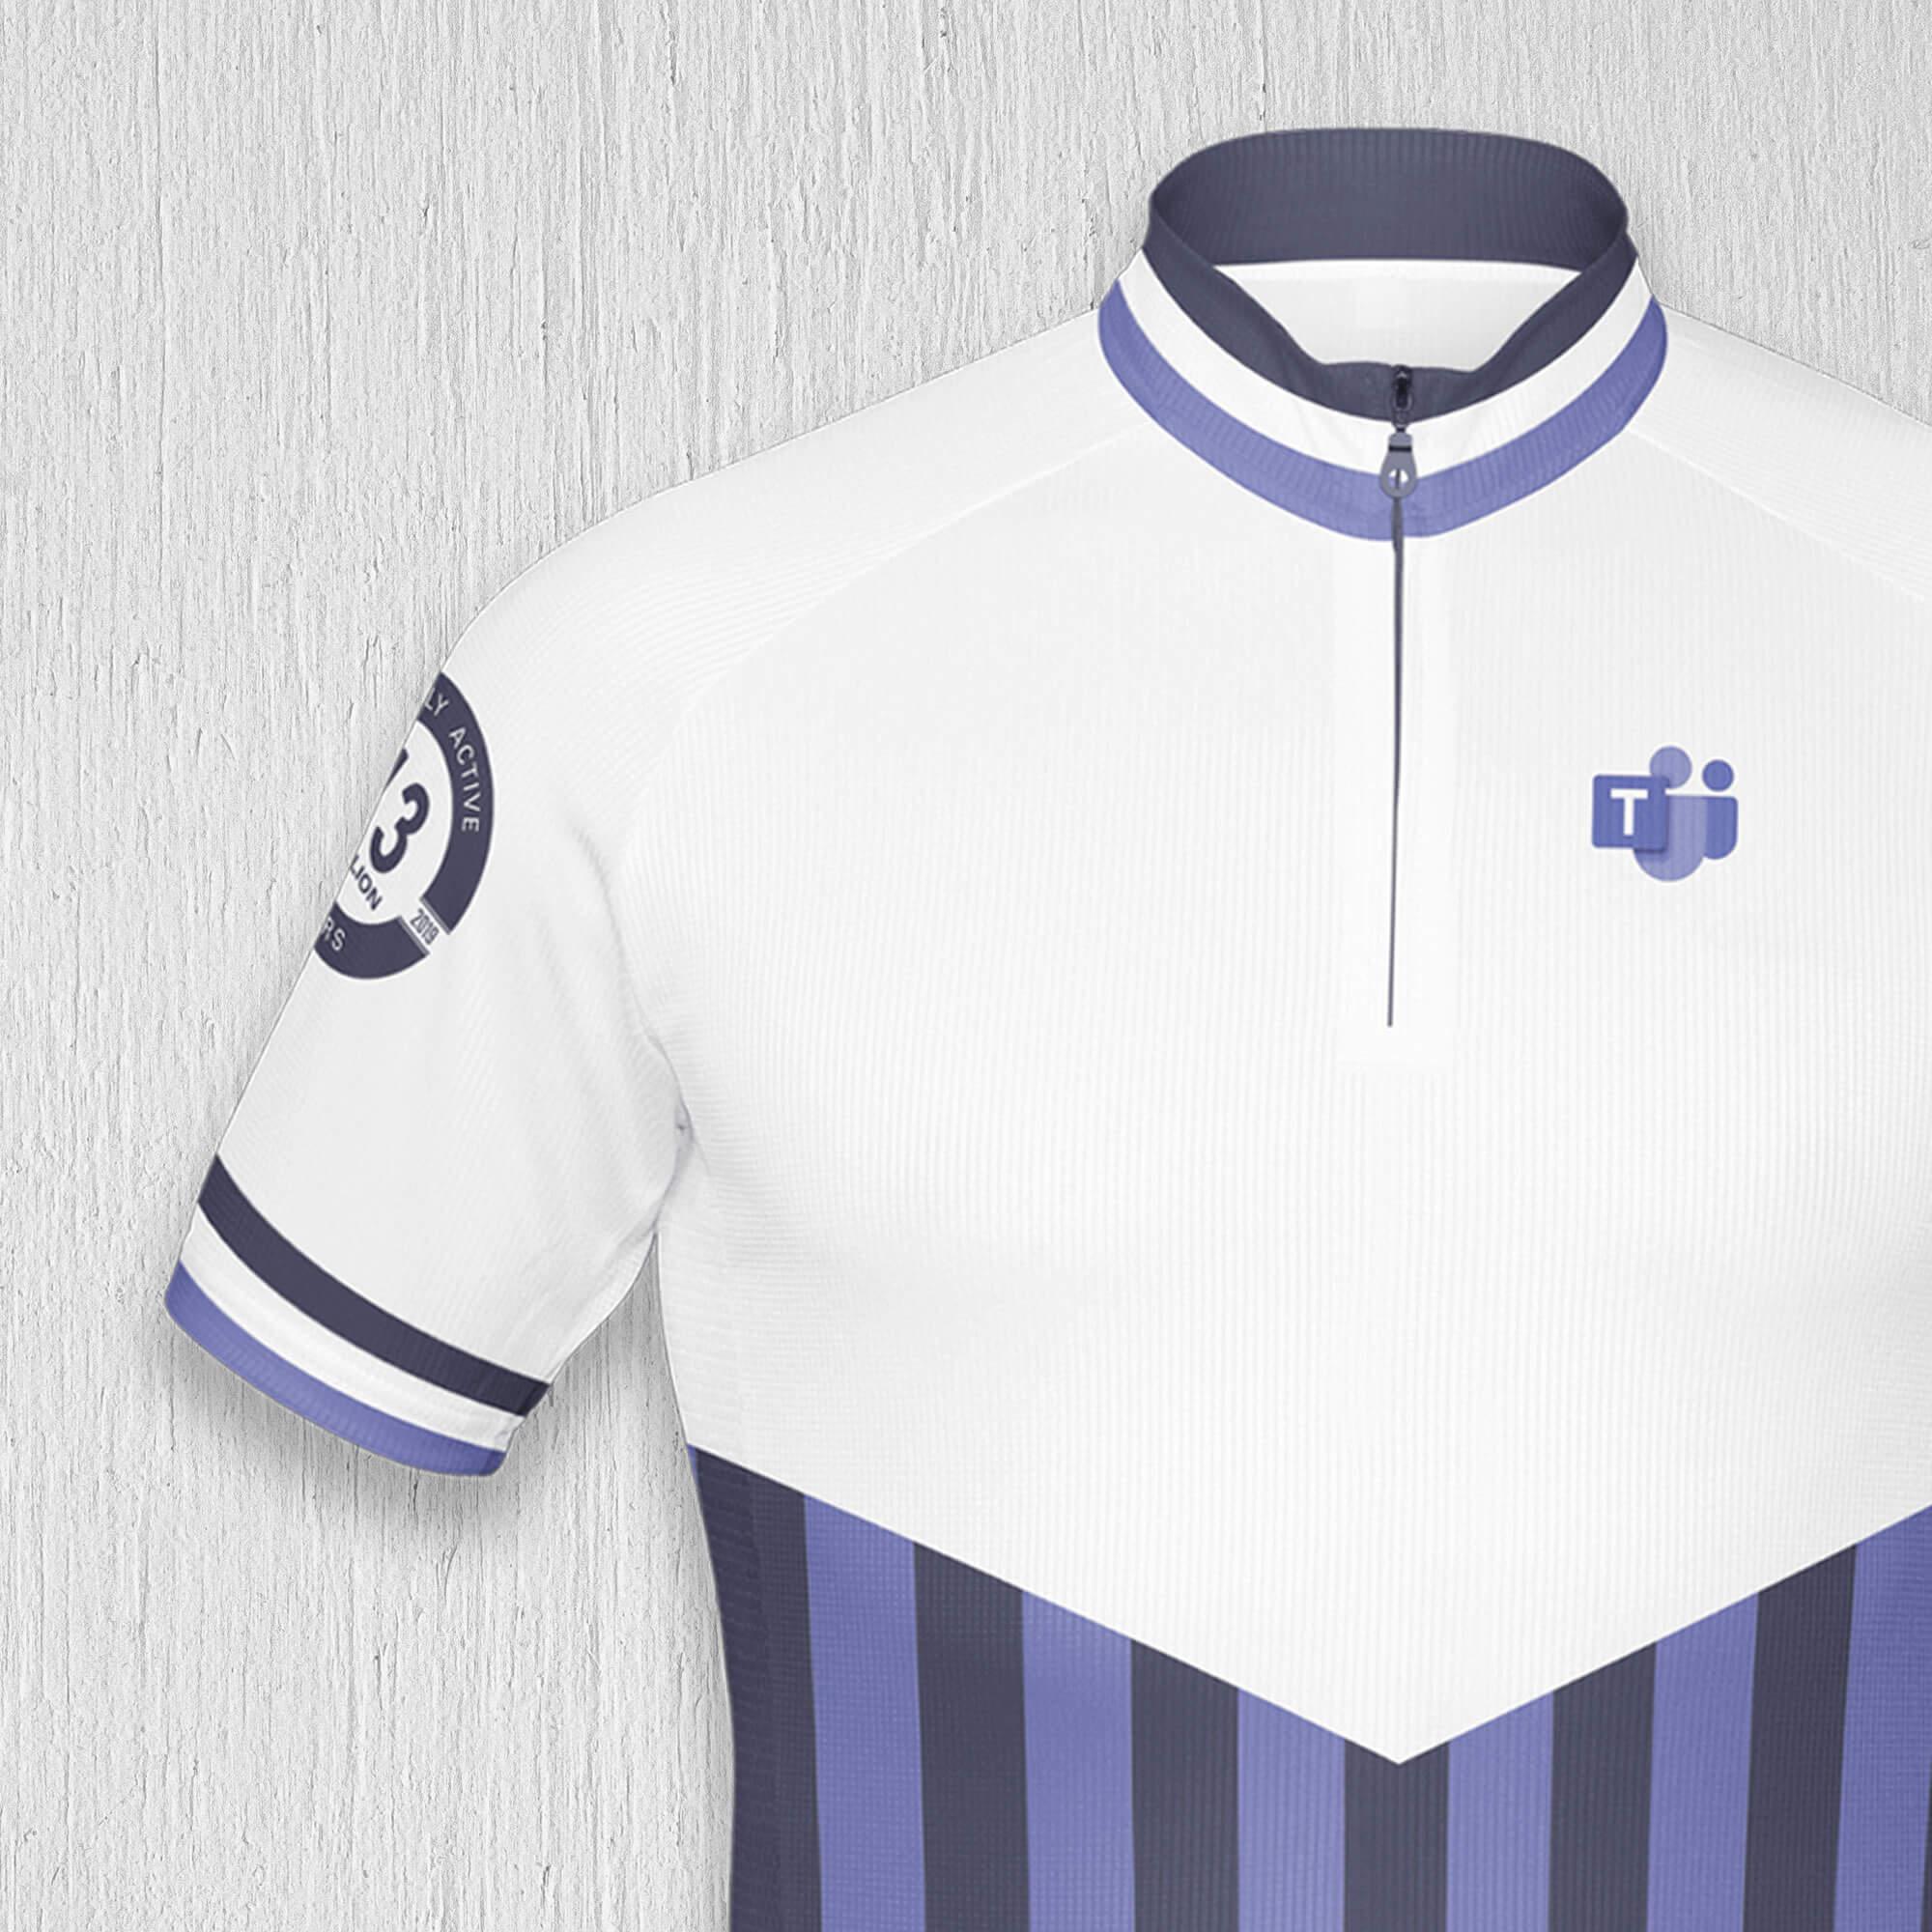 Microsoft Teams Cycling Jersey